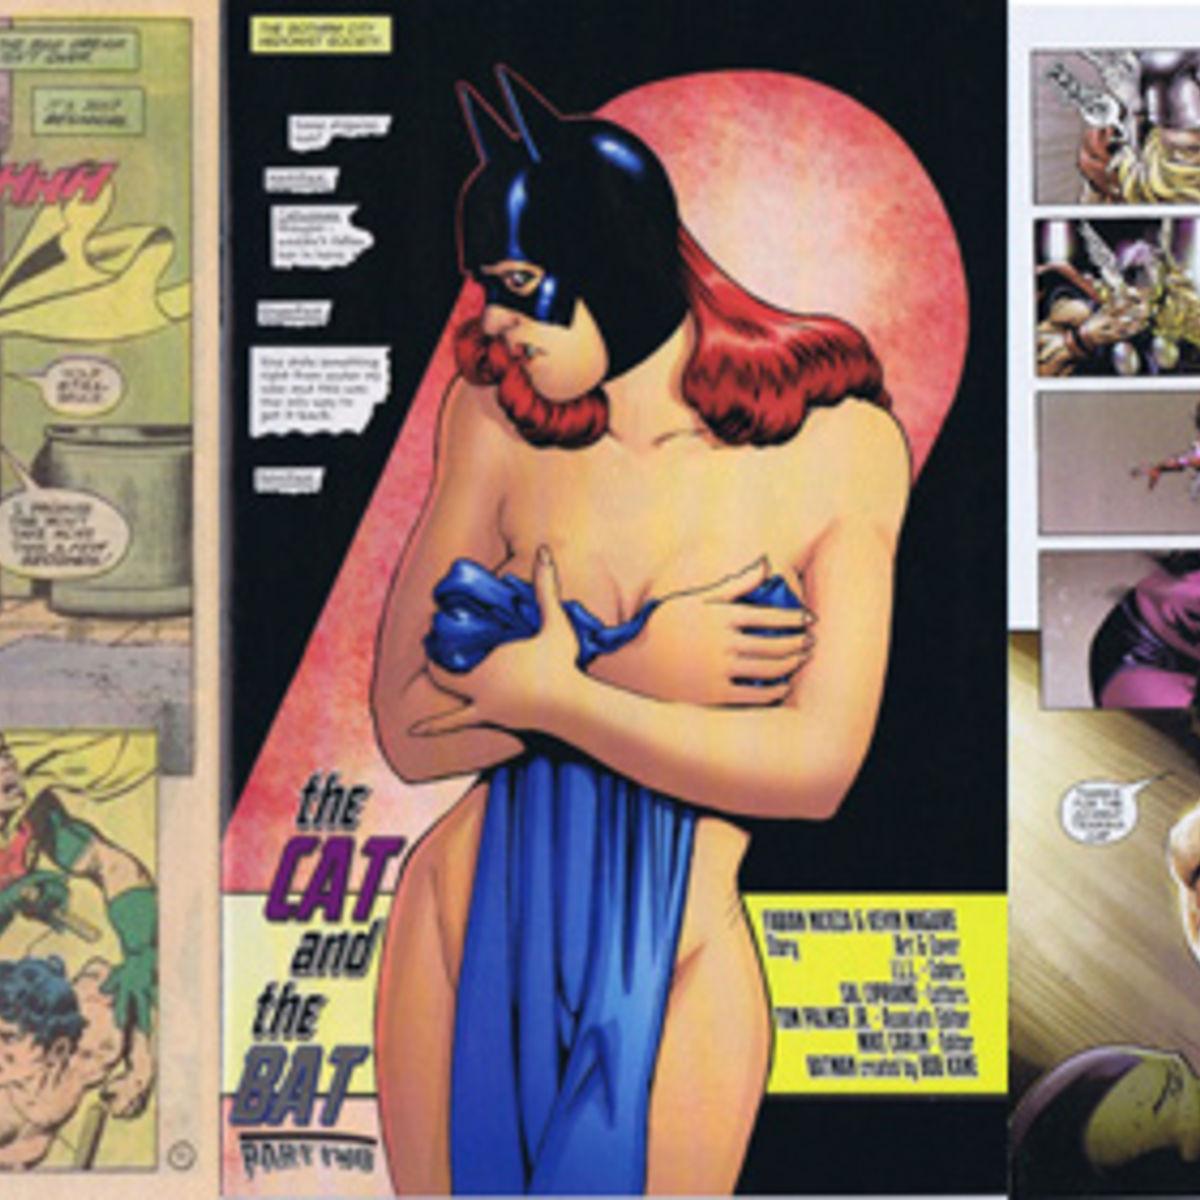 ComicBookNudeScenesLead_0.jpg